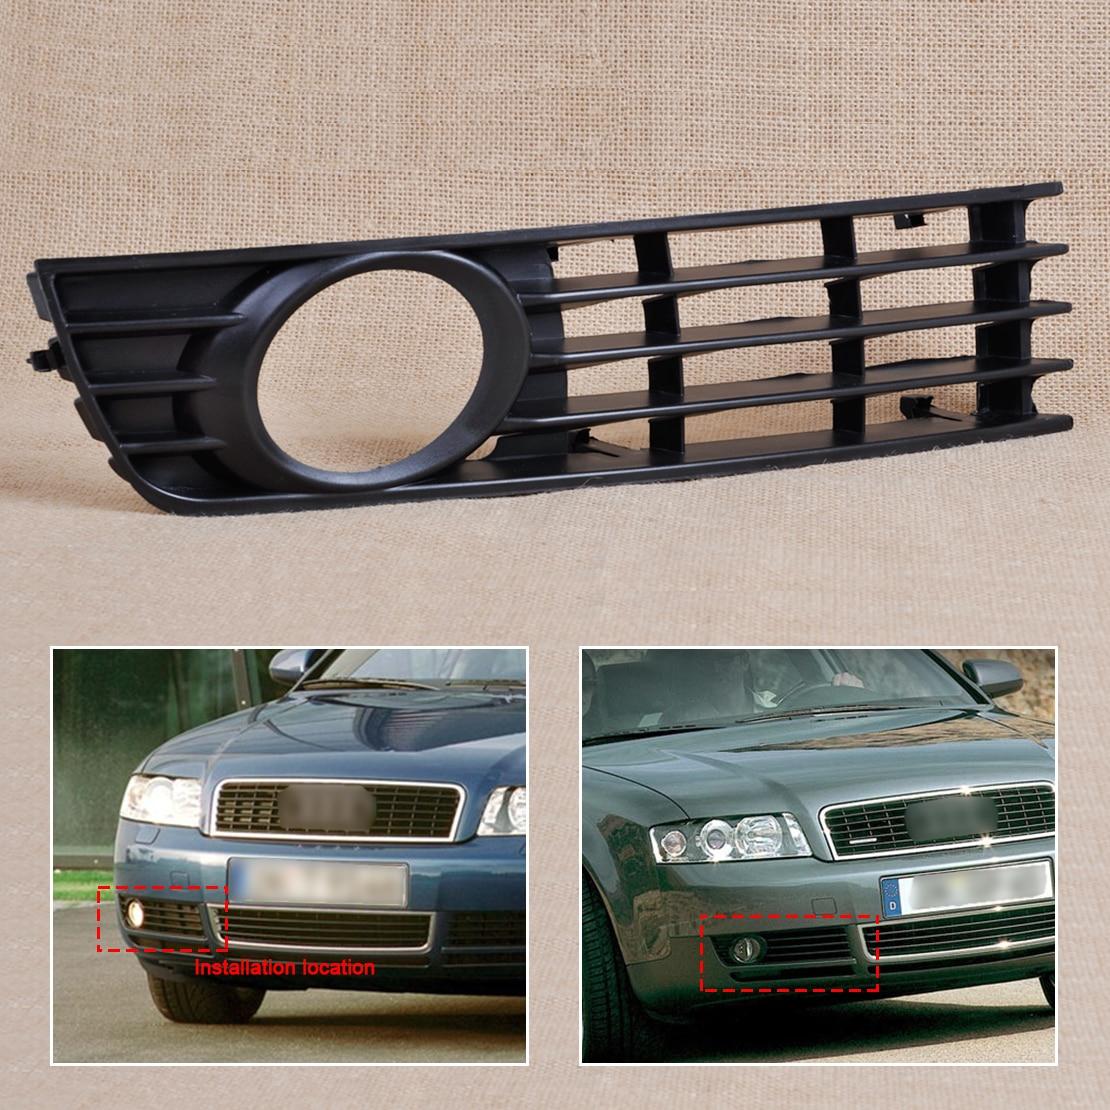 For 2002-2005 Audi A4 B6 Front Left Bumper Fog Light Right Grille cover Mesh